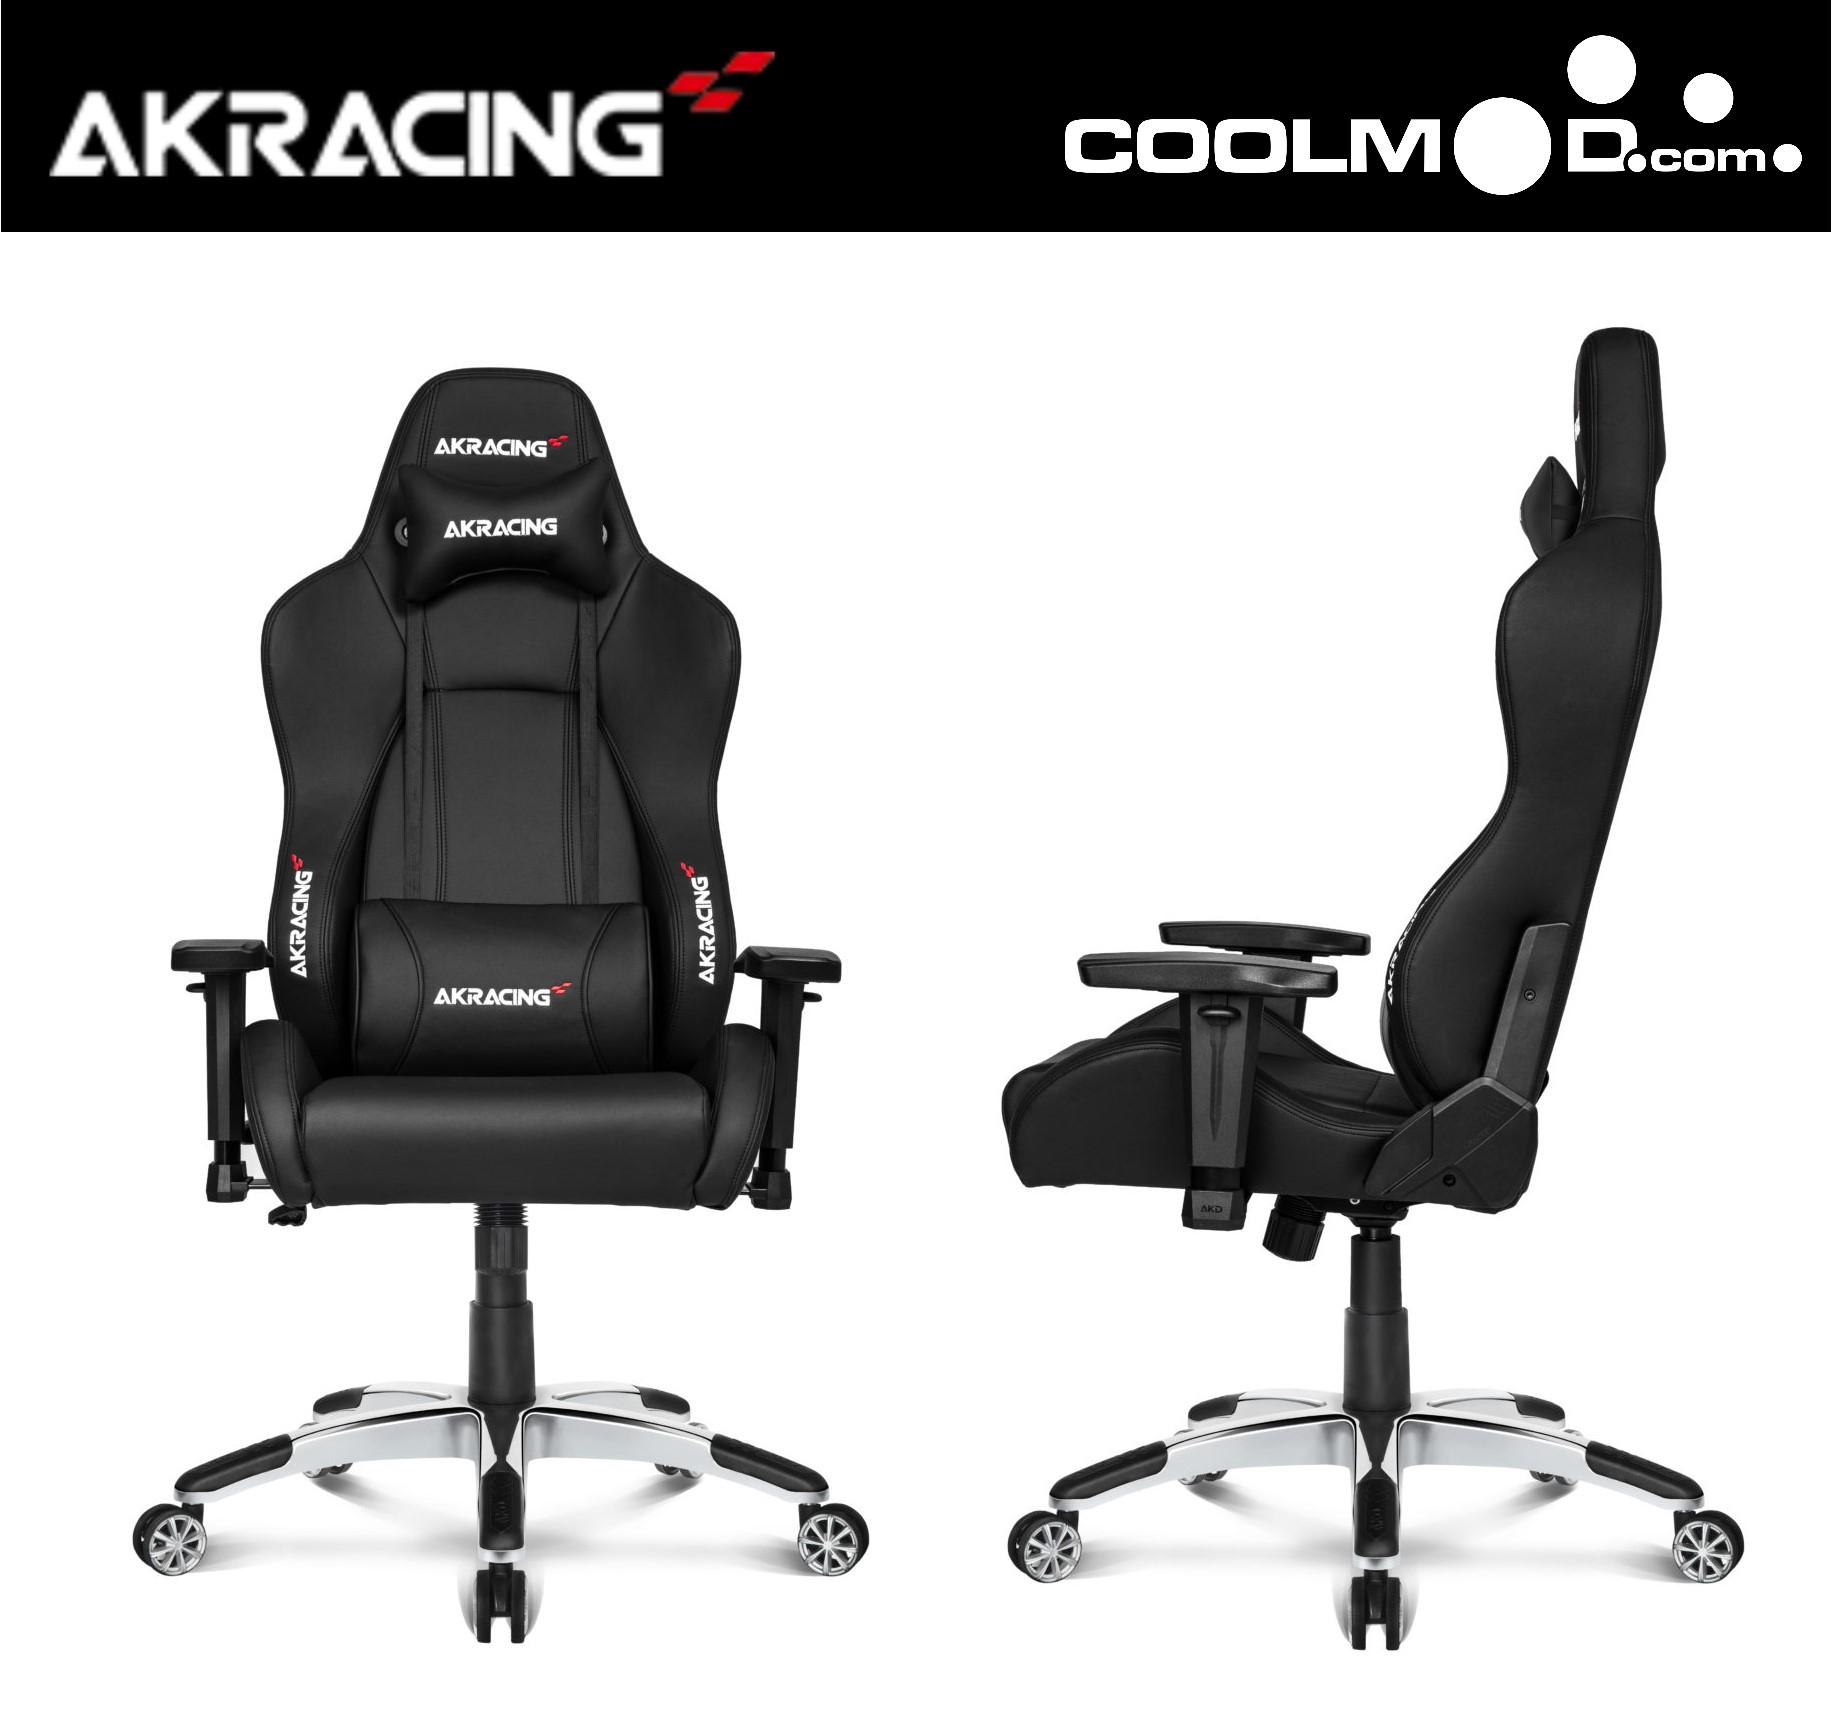 Silla Oficina/Gaming - AKRacing Masters Series Premium Negro [10 Años Garantía]